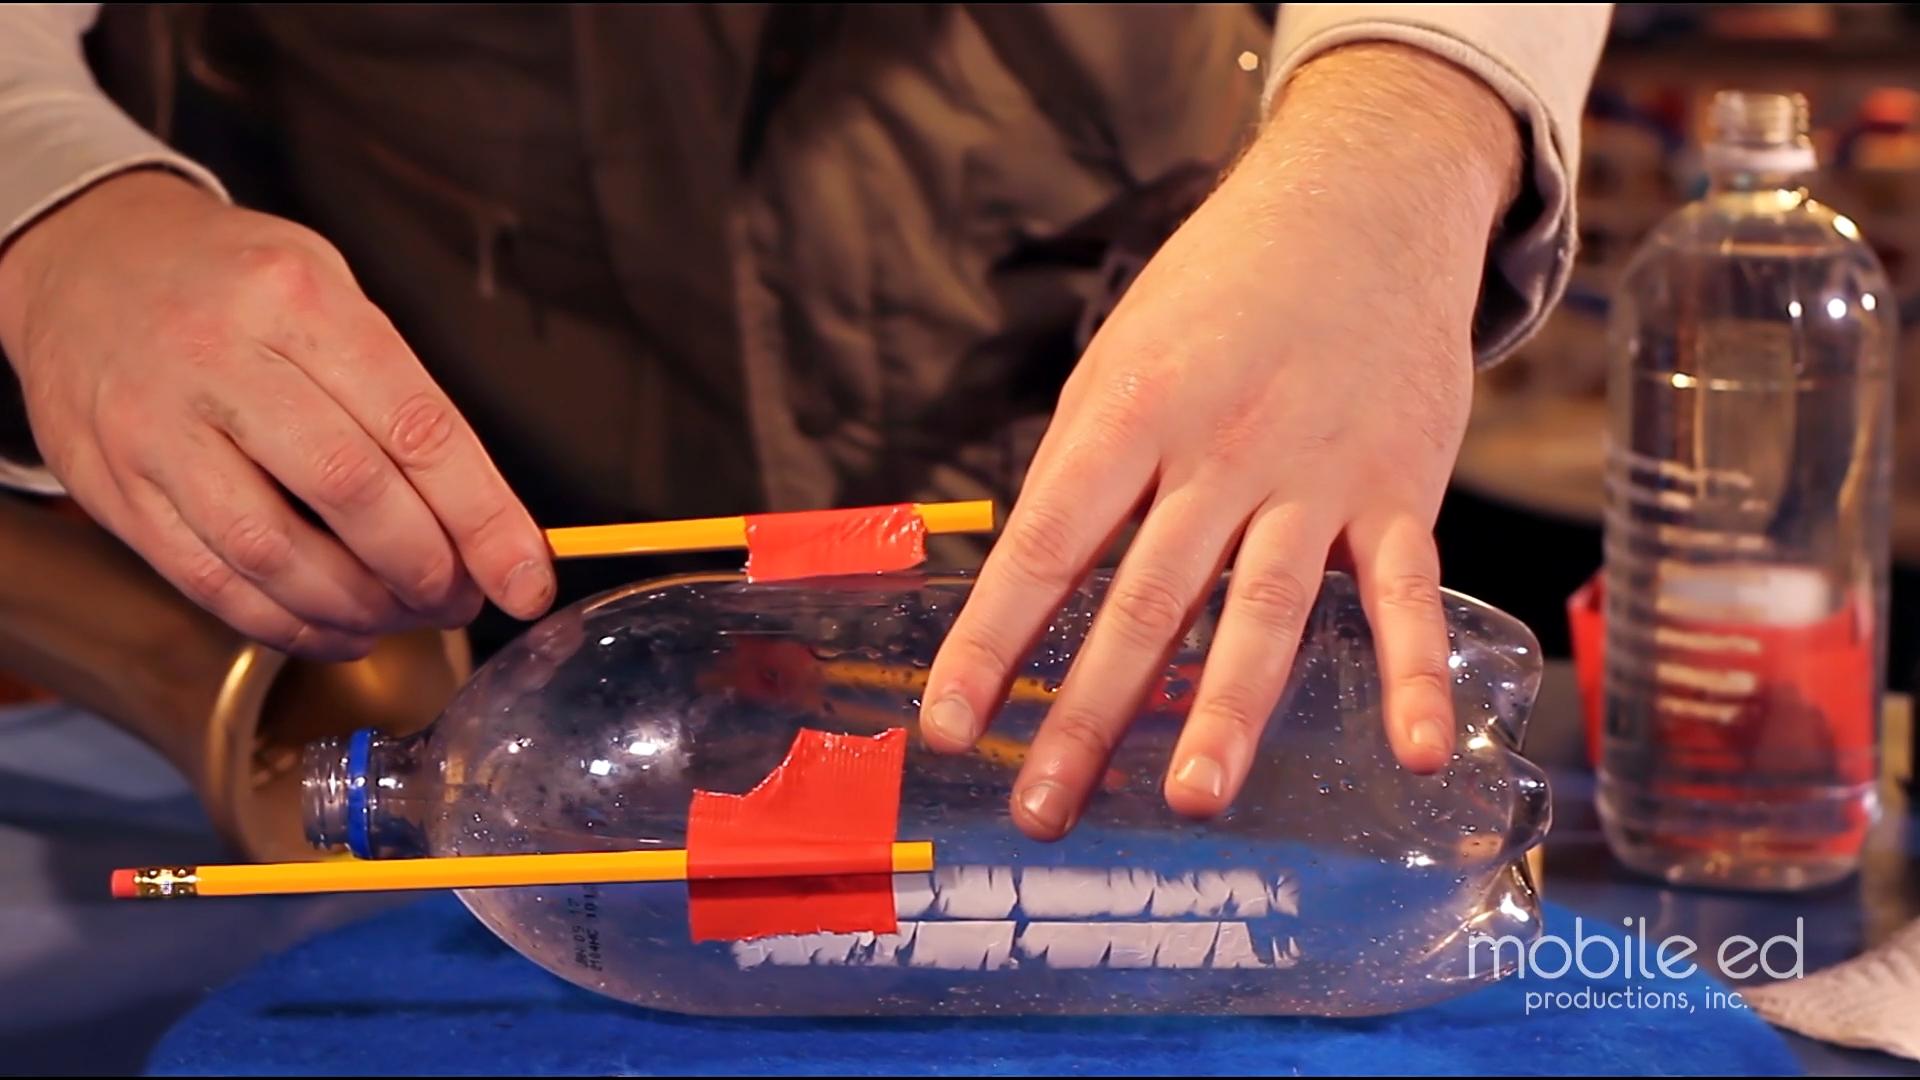 Build your own rocket - add the legs  |  Handy Dan the Junkyard Man